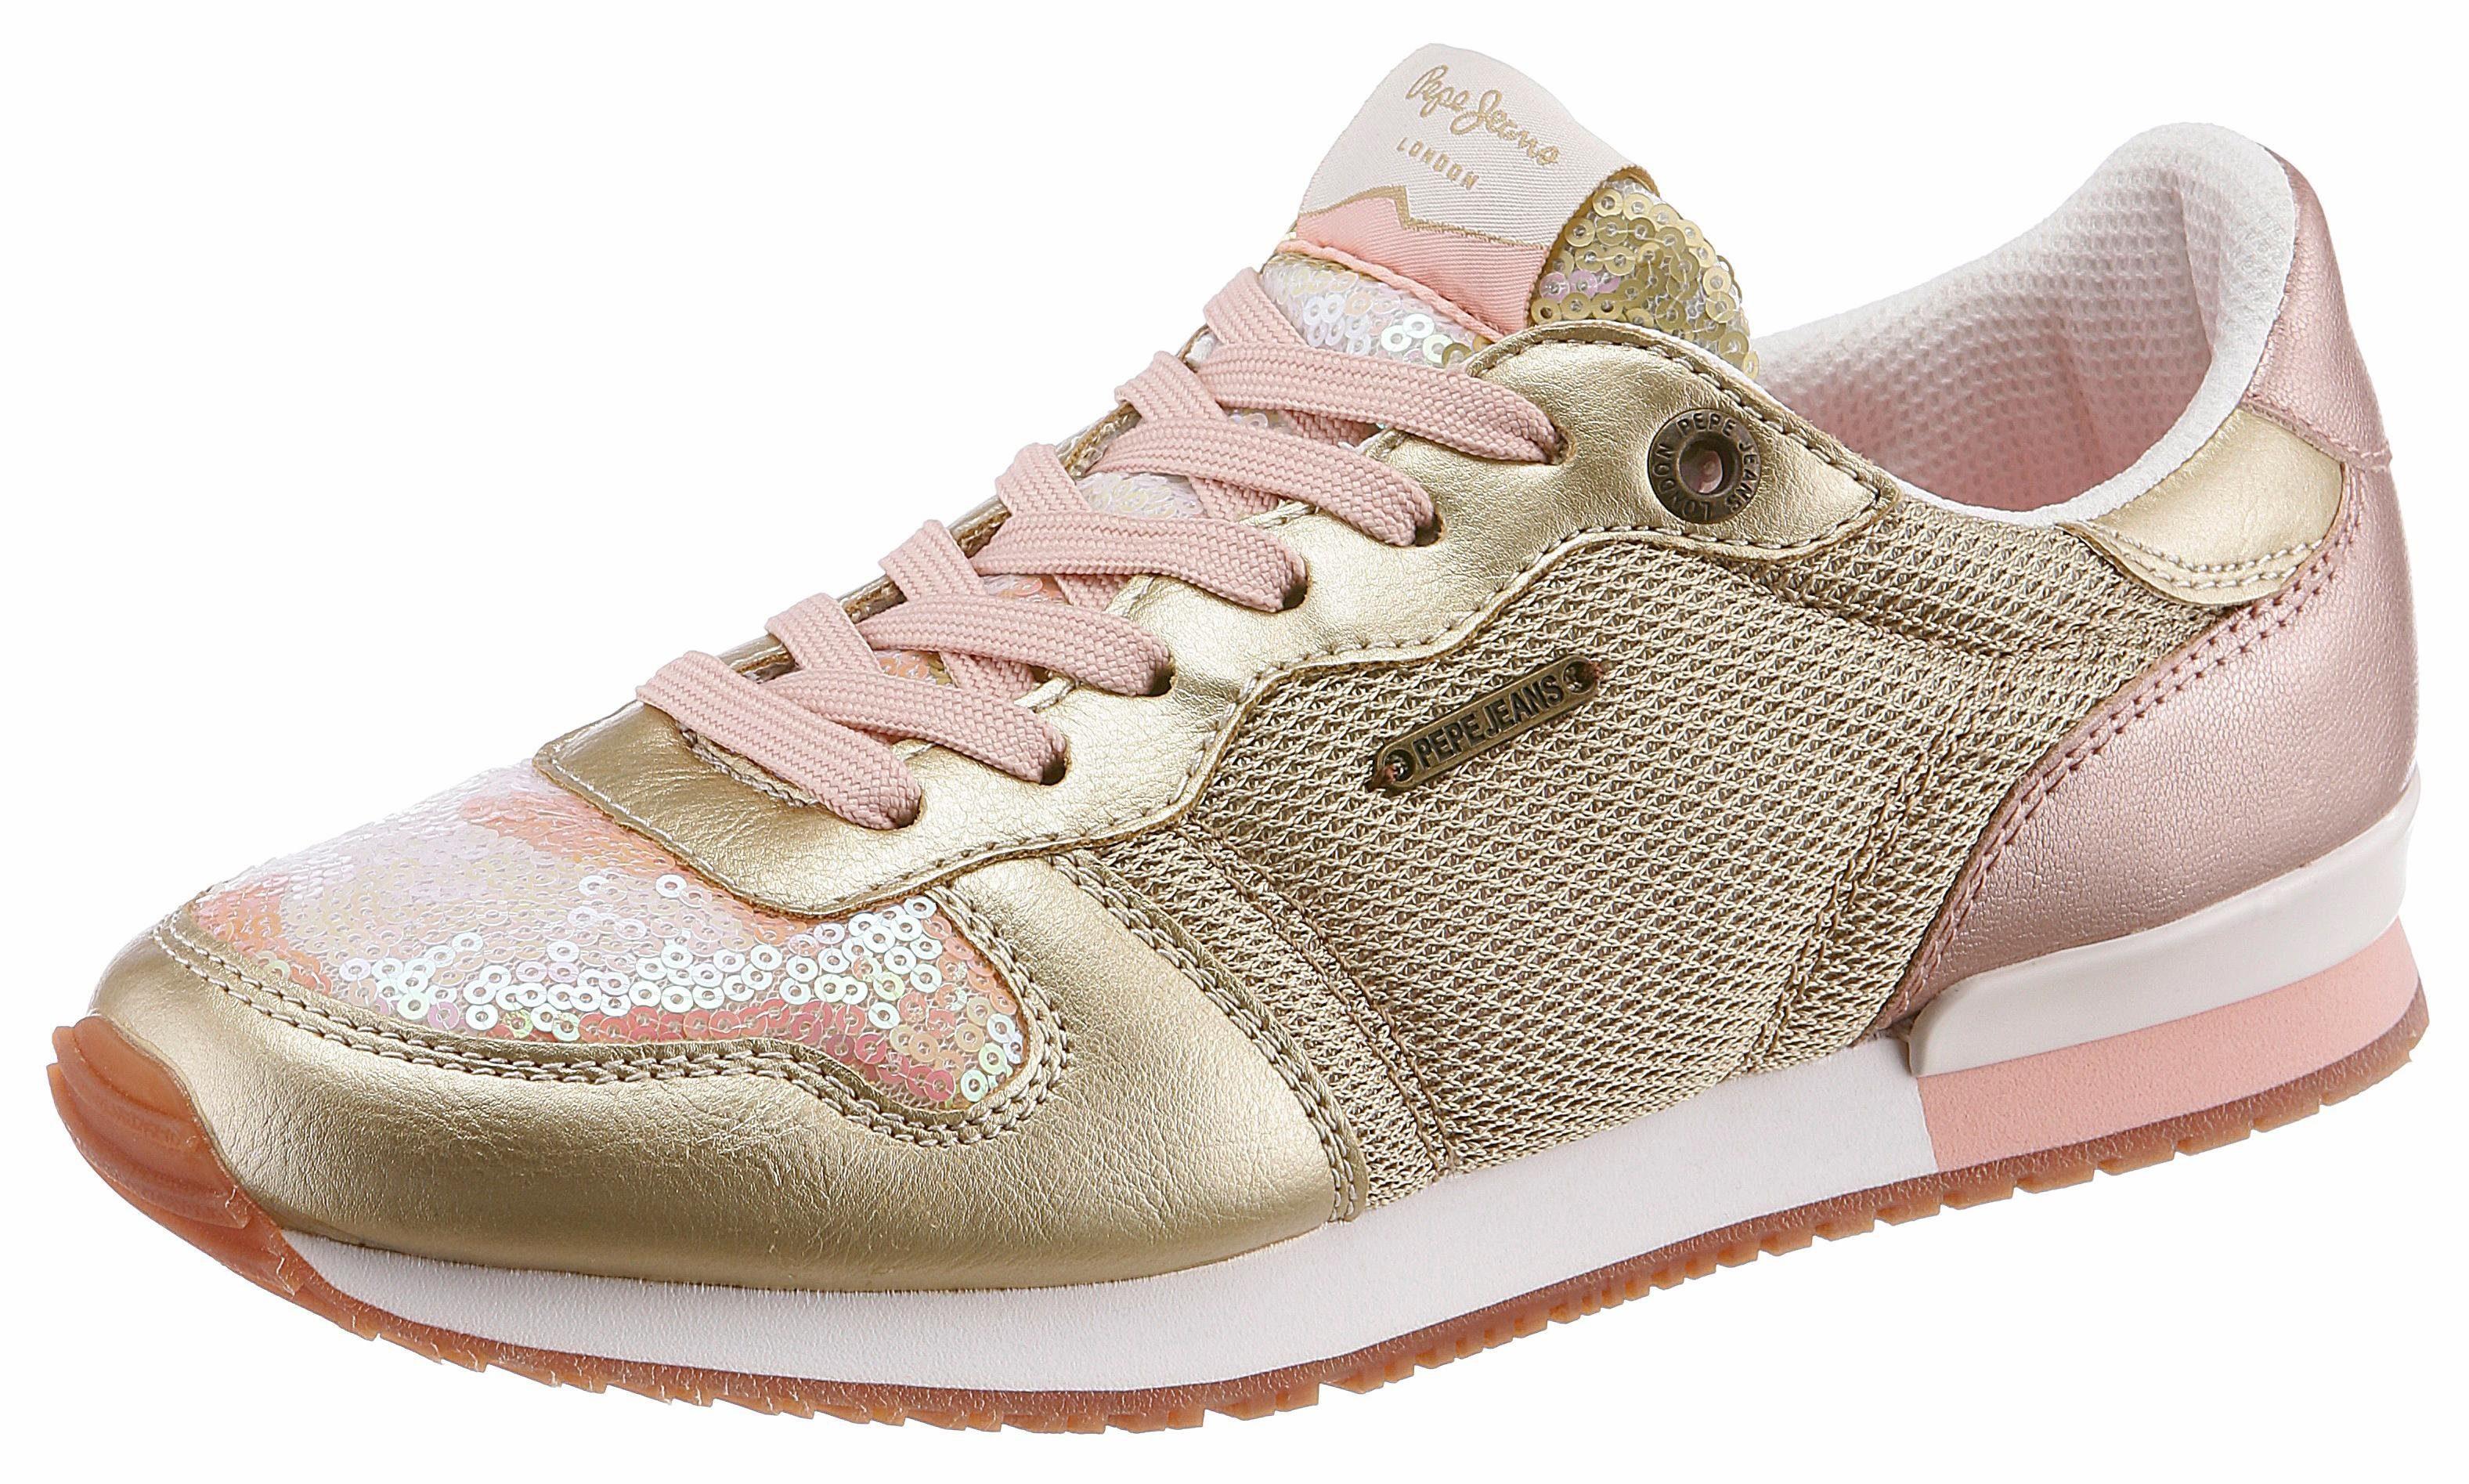 Pepe Jeans »VERONA W SEQUINS« Sneaker, mit schimmernden Pailletten, gold, 38 38